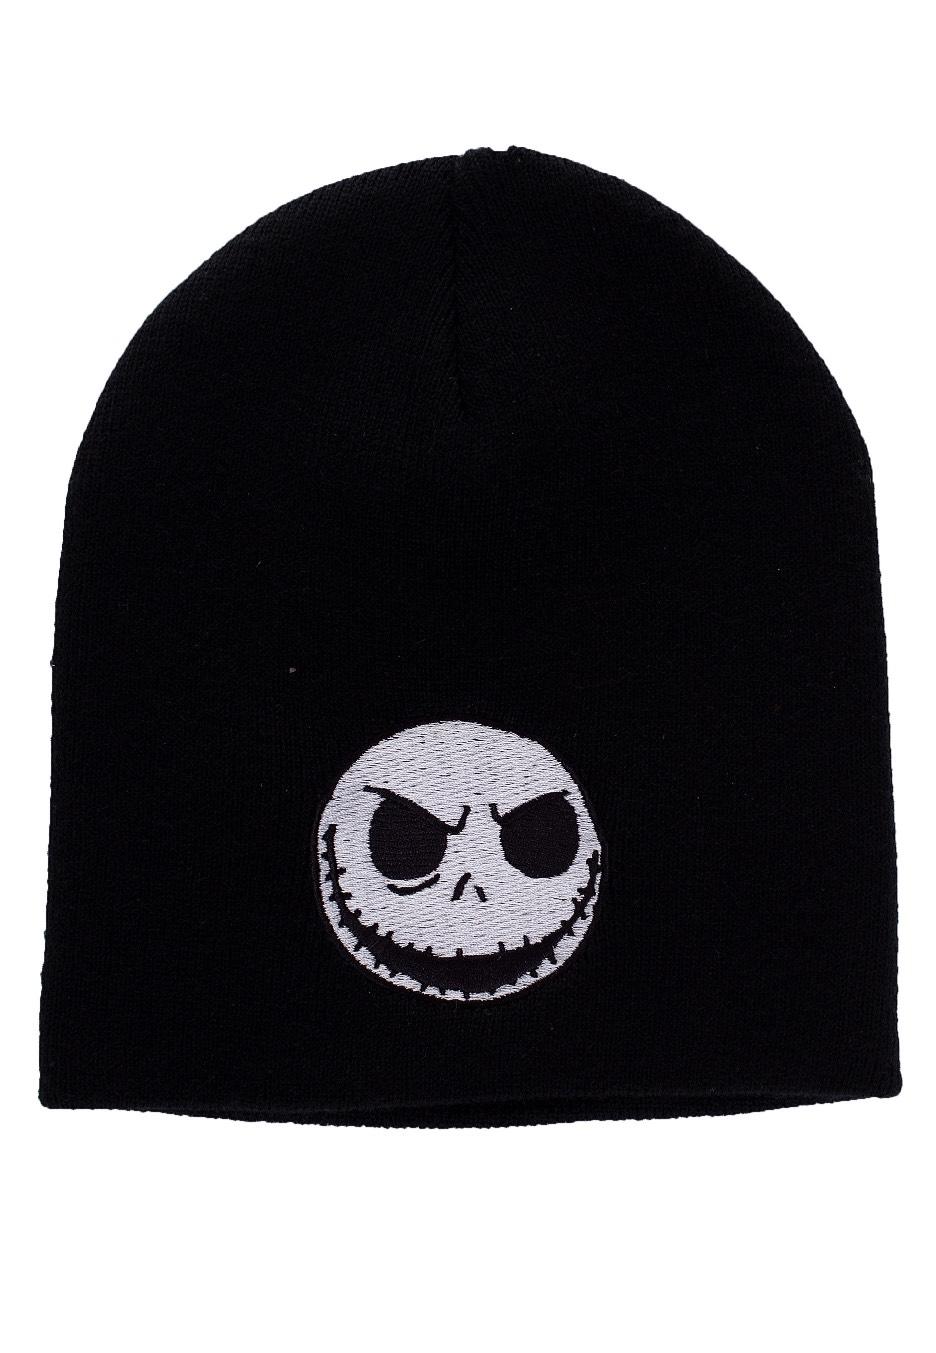 The Nightmare Before Christmas - Skull - Beanie